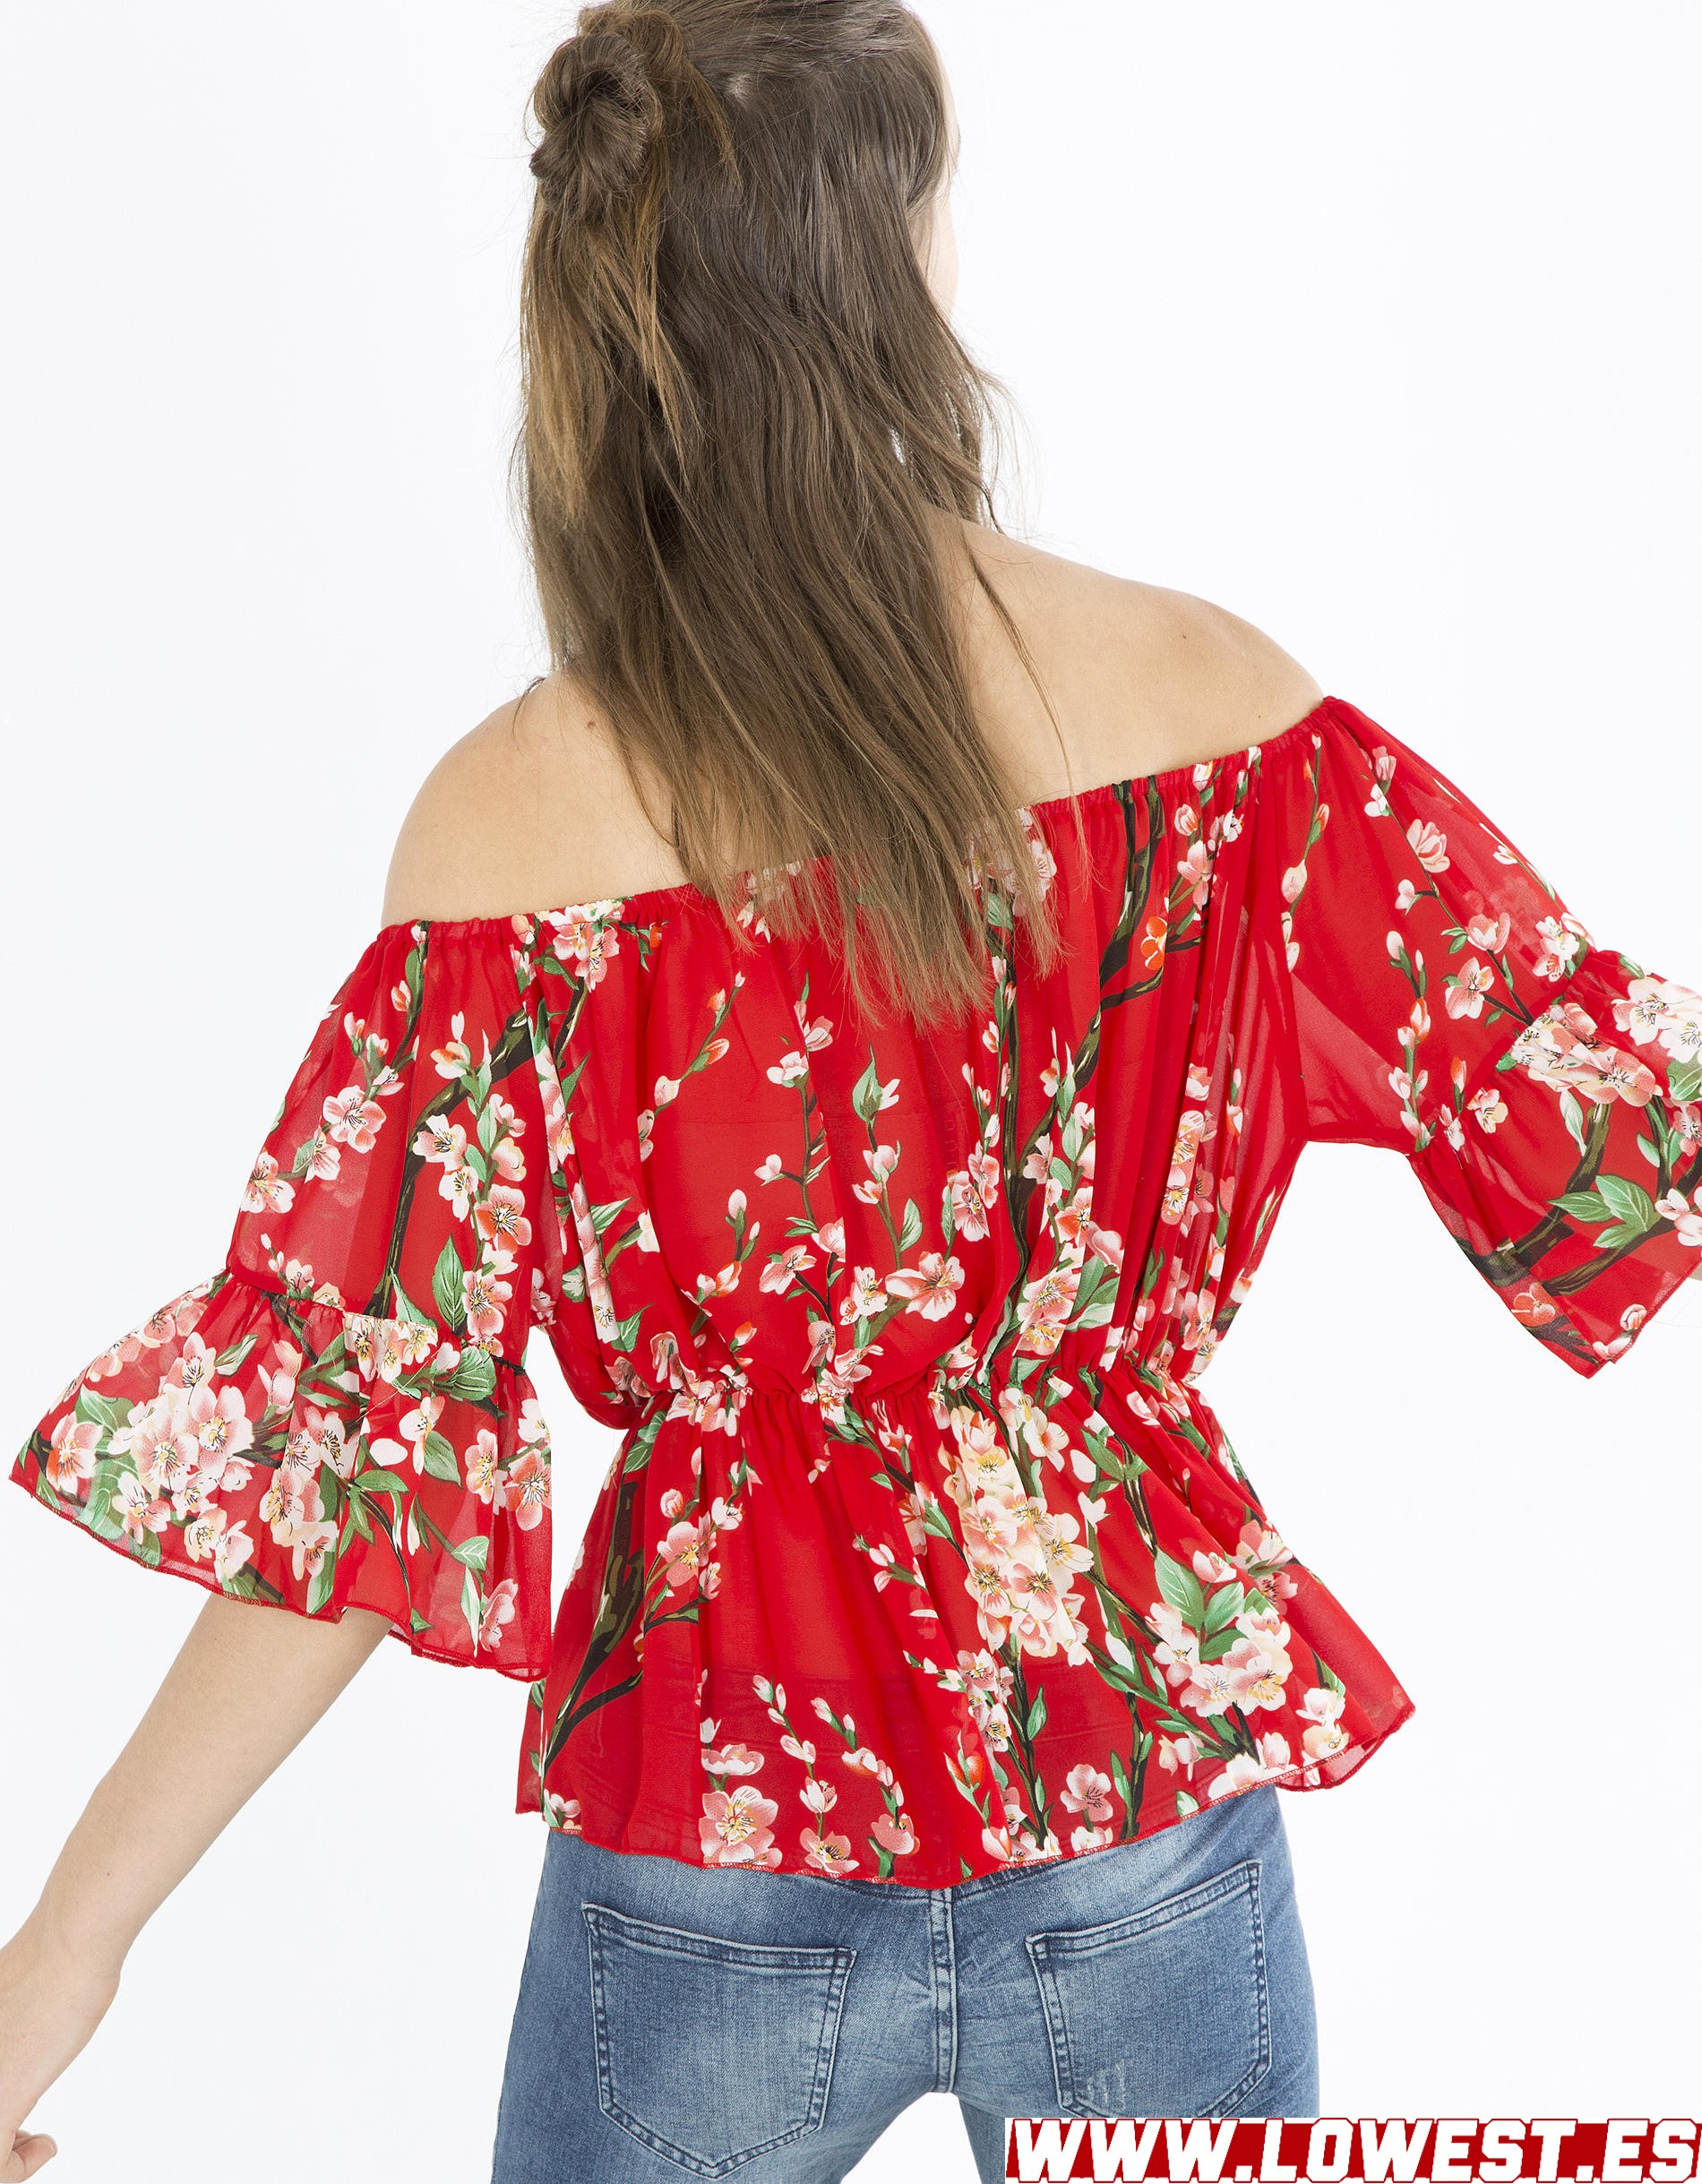 moda primavera verano vestidos espalda descubierta Lowest 2019 2020